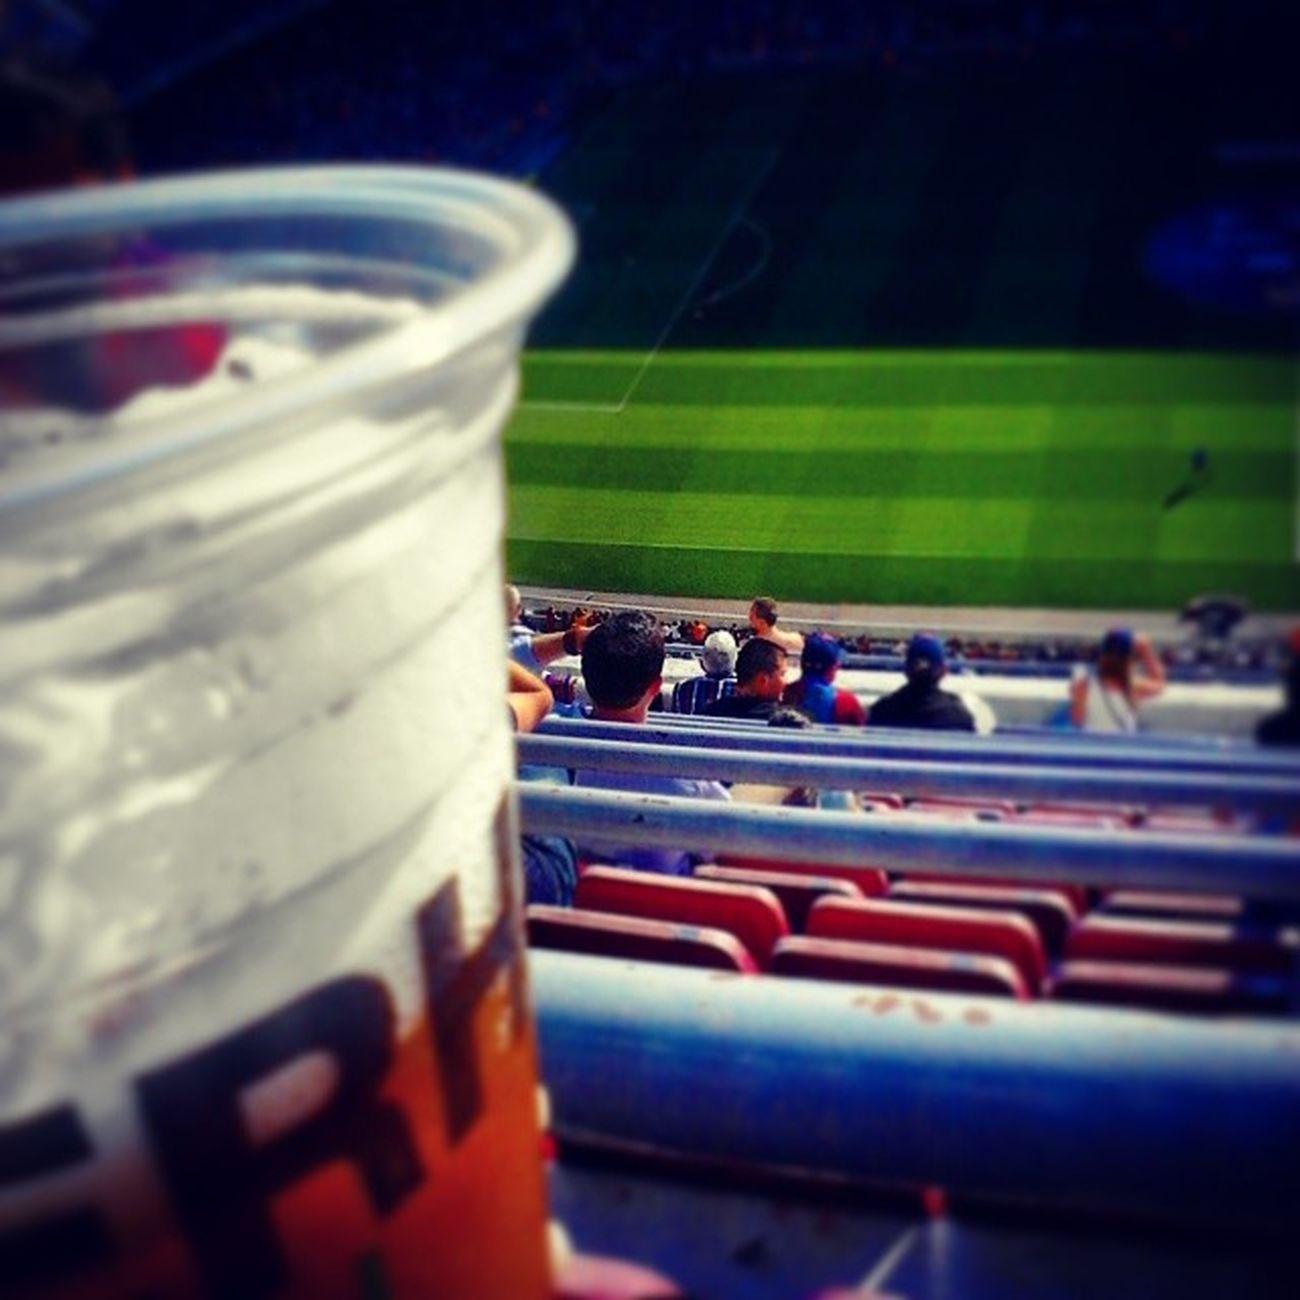 Barcelona Barcelonagram Noucamp FCBarcelona  stadium beer happytimes bcninspira lescorts